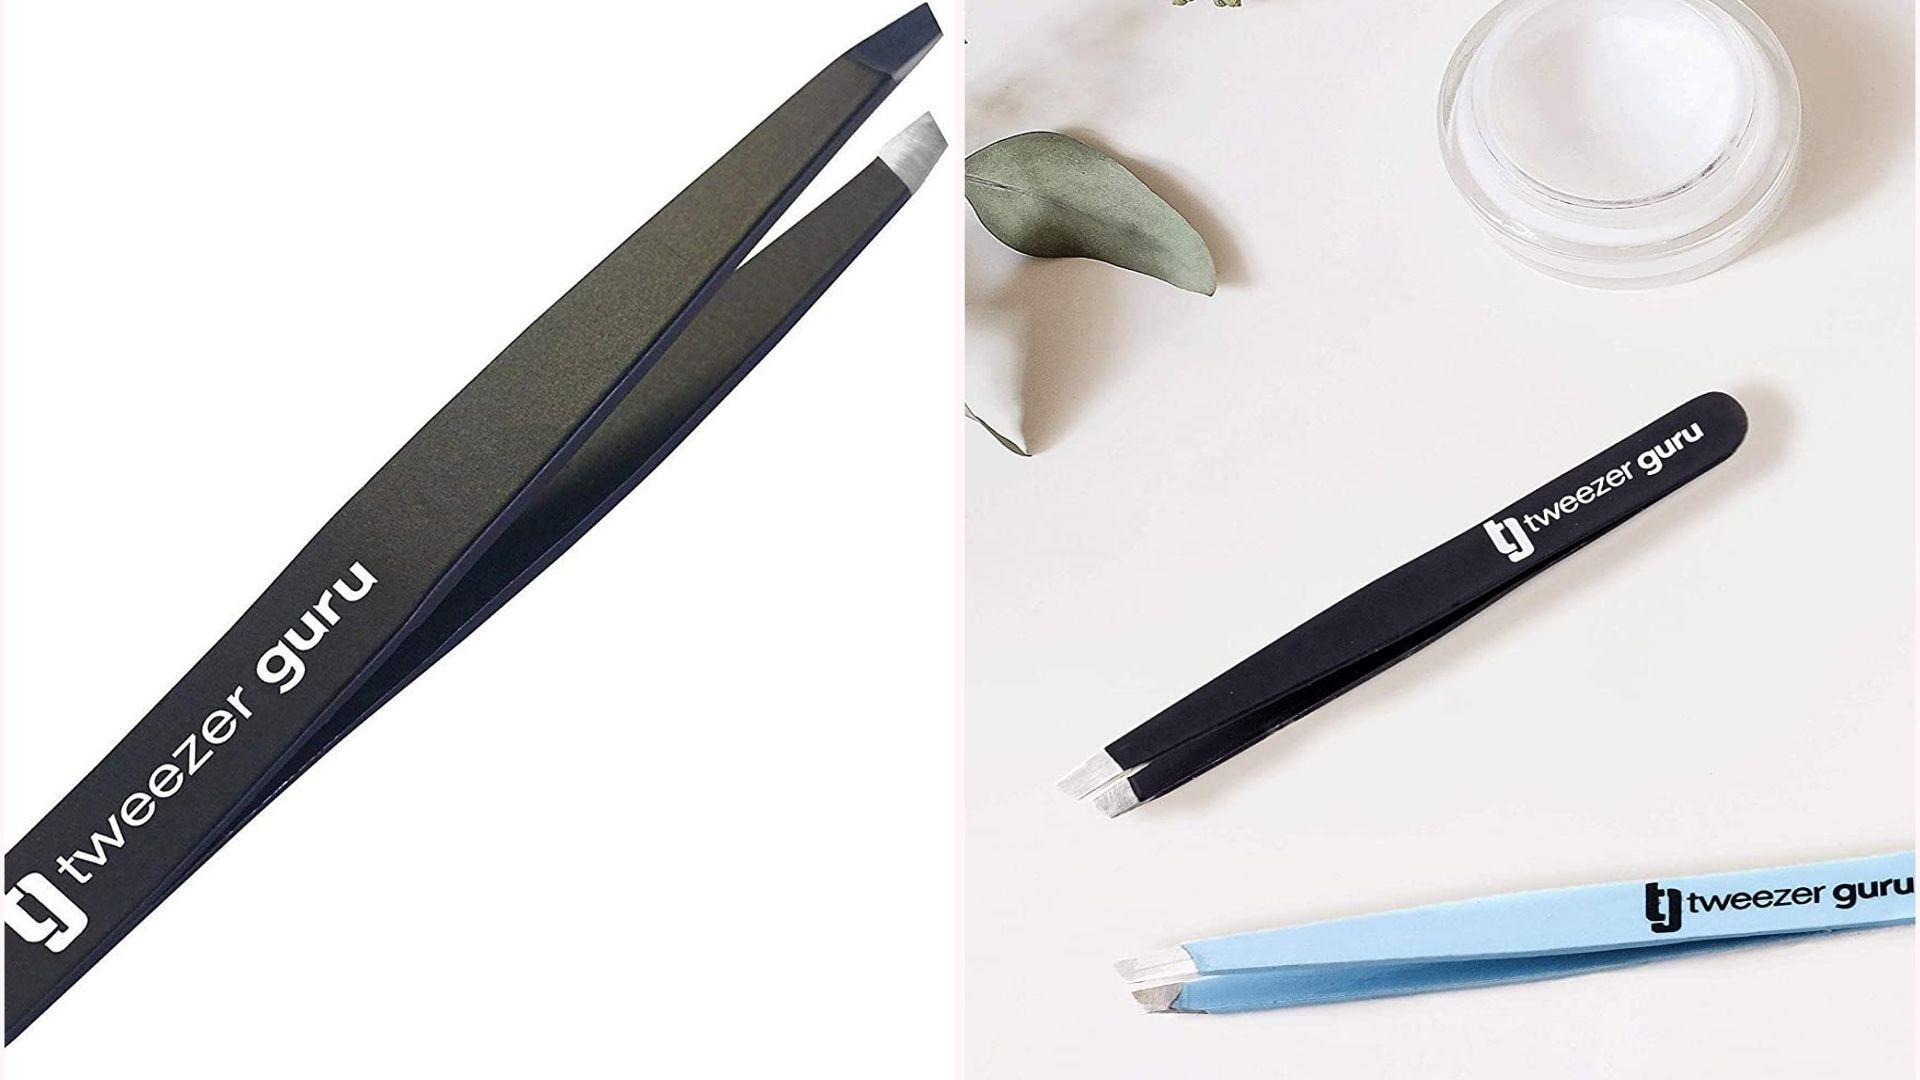 small black and blue metal tweezers